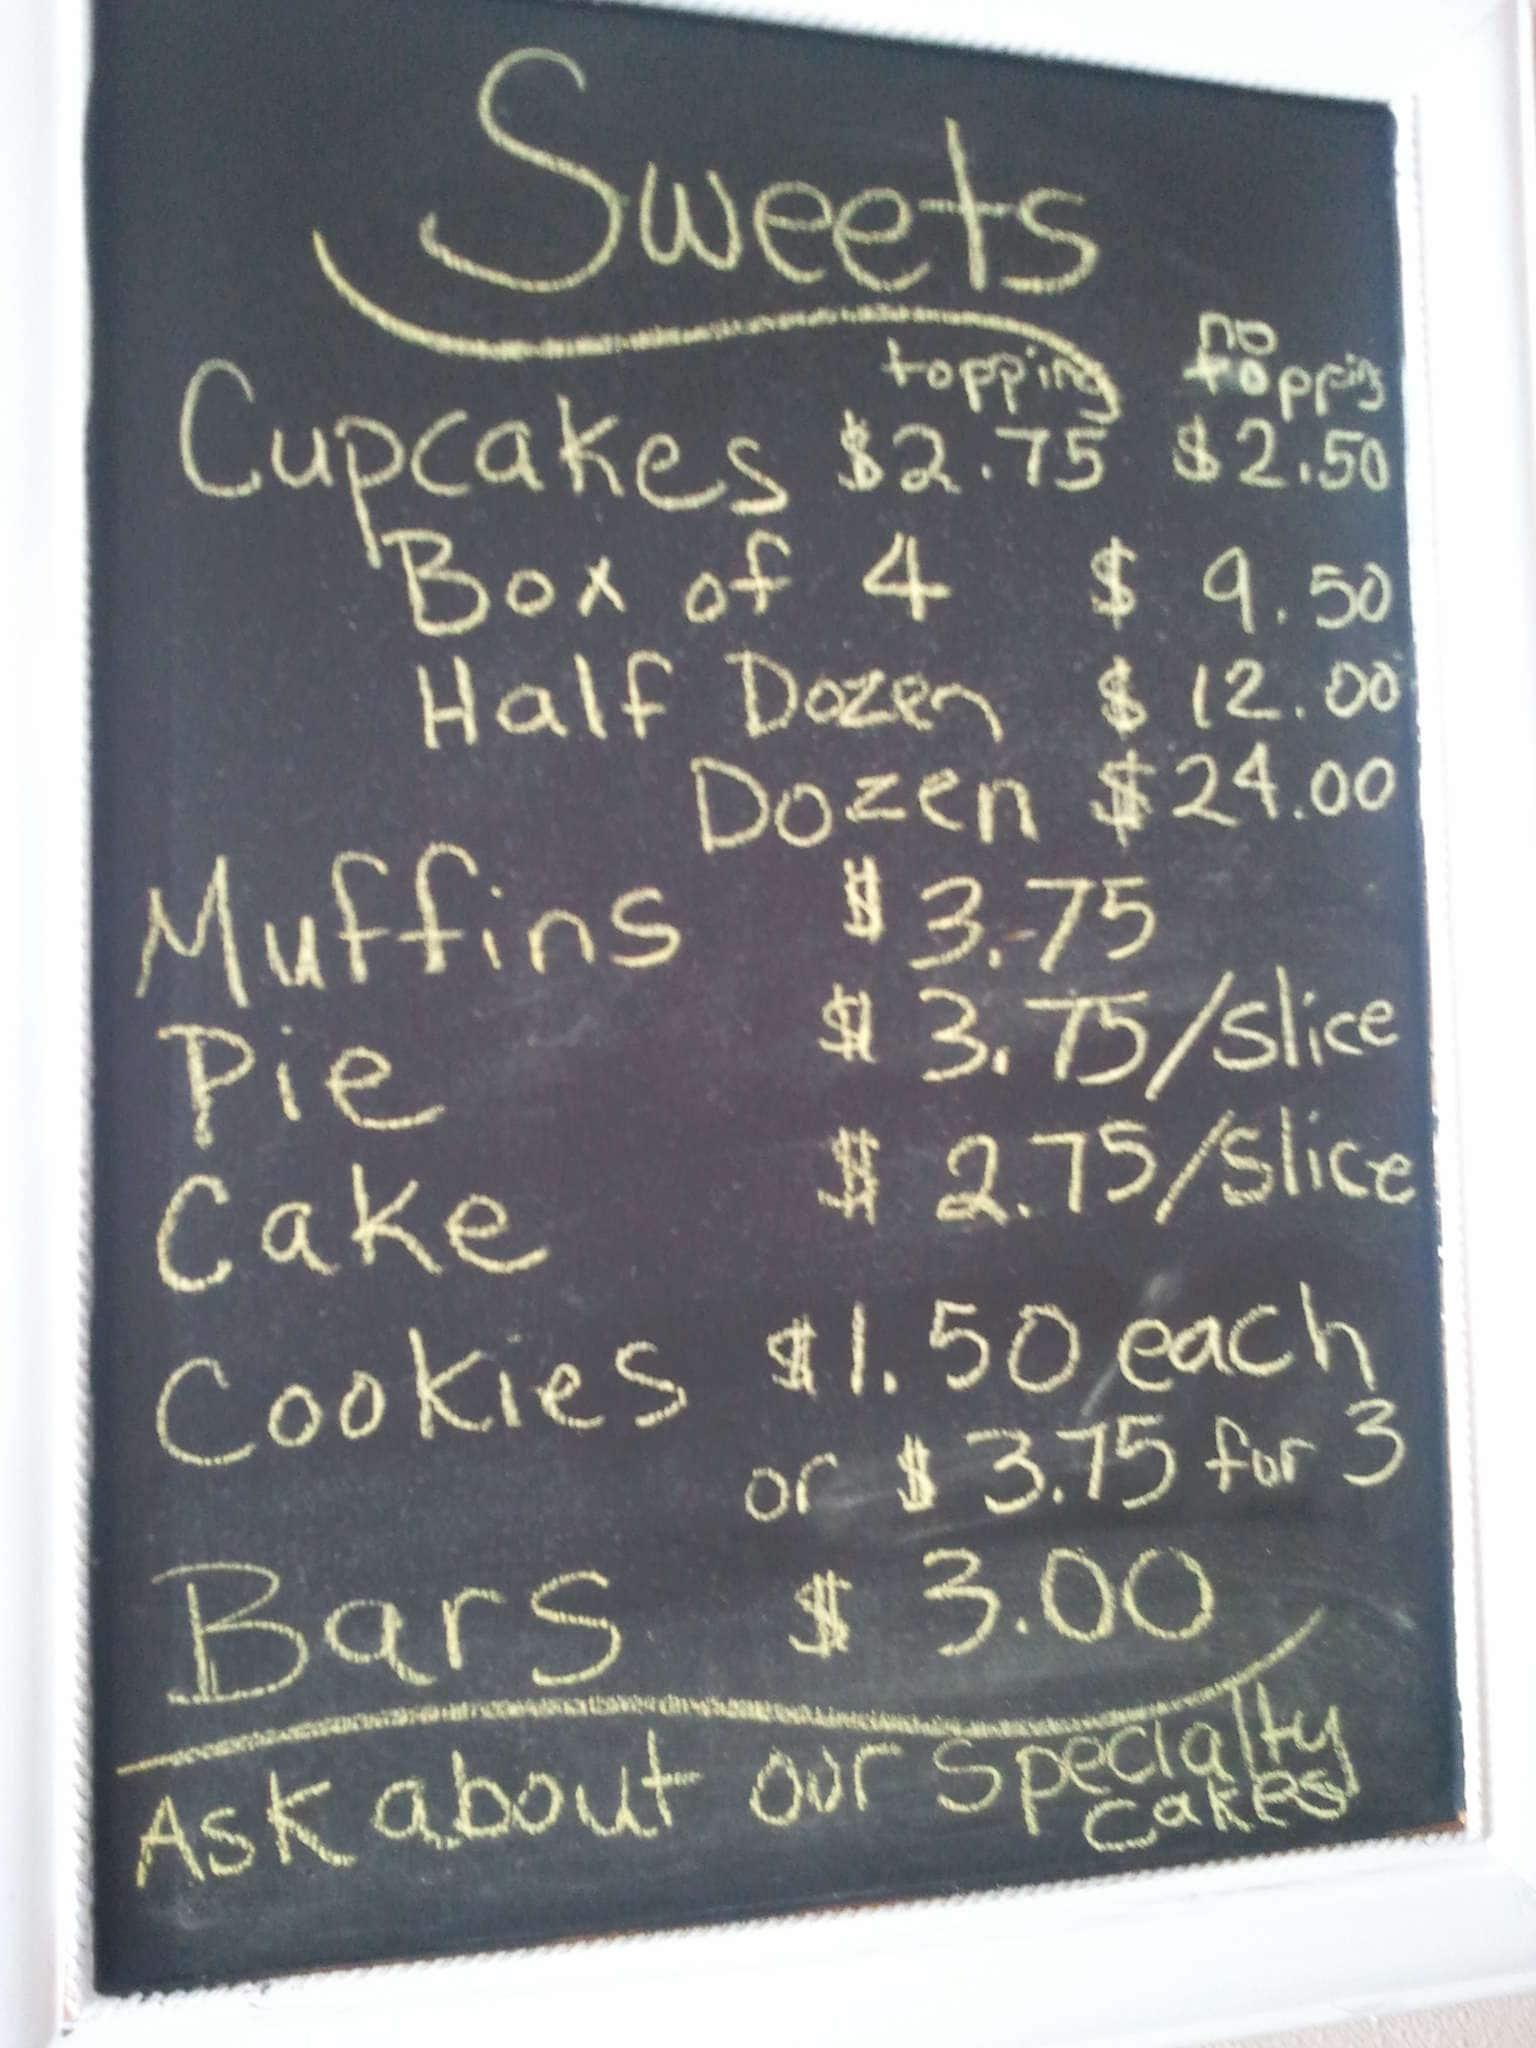 La Dolce Vita Bakery, Bryson City Menu